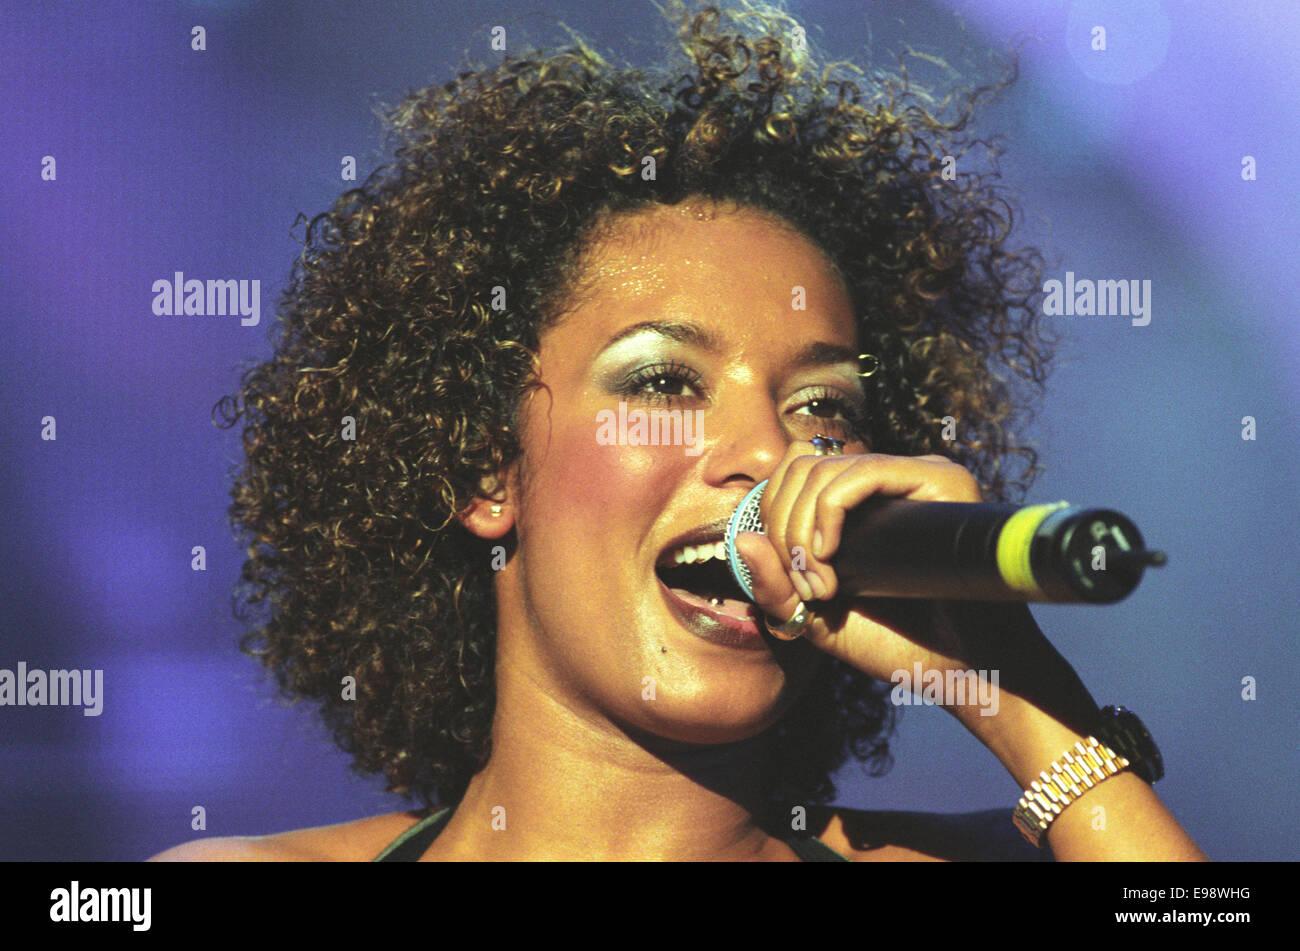 Spice Girls in concert at Glasgow SECC, in Glasgow, Scotland, in 1998. - Stock Image